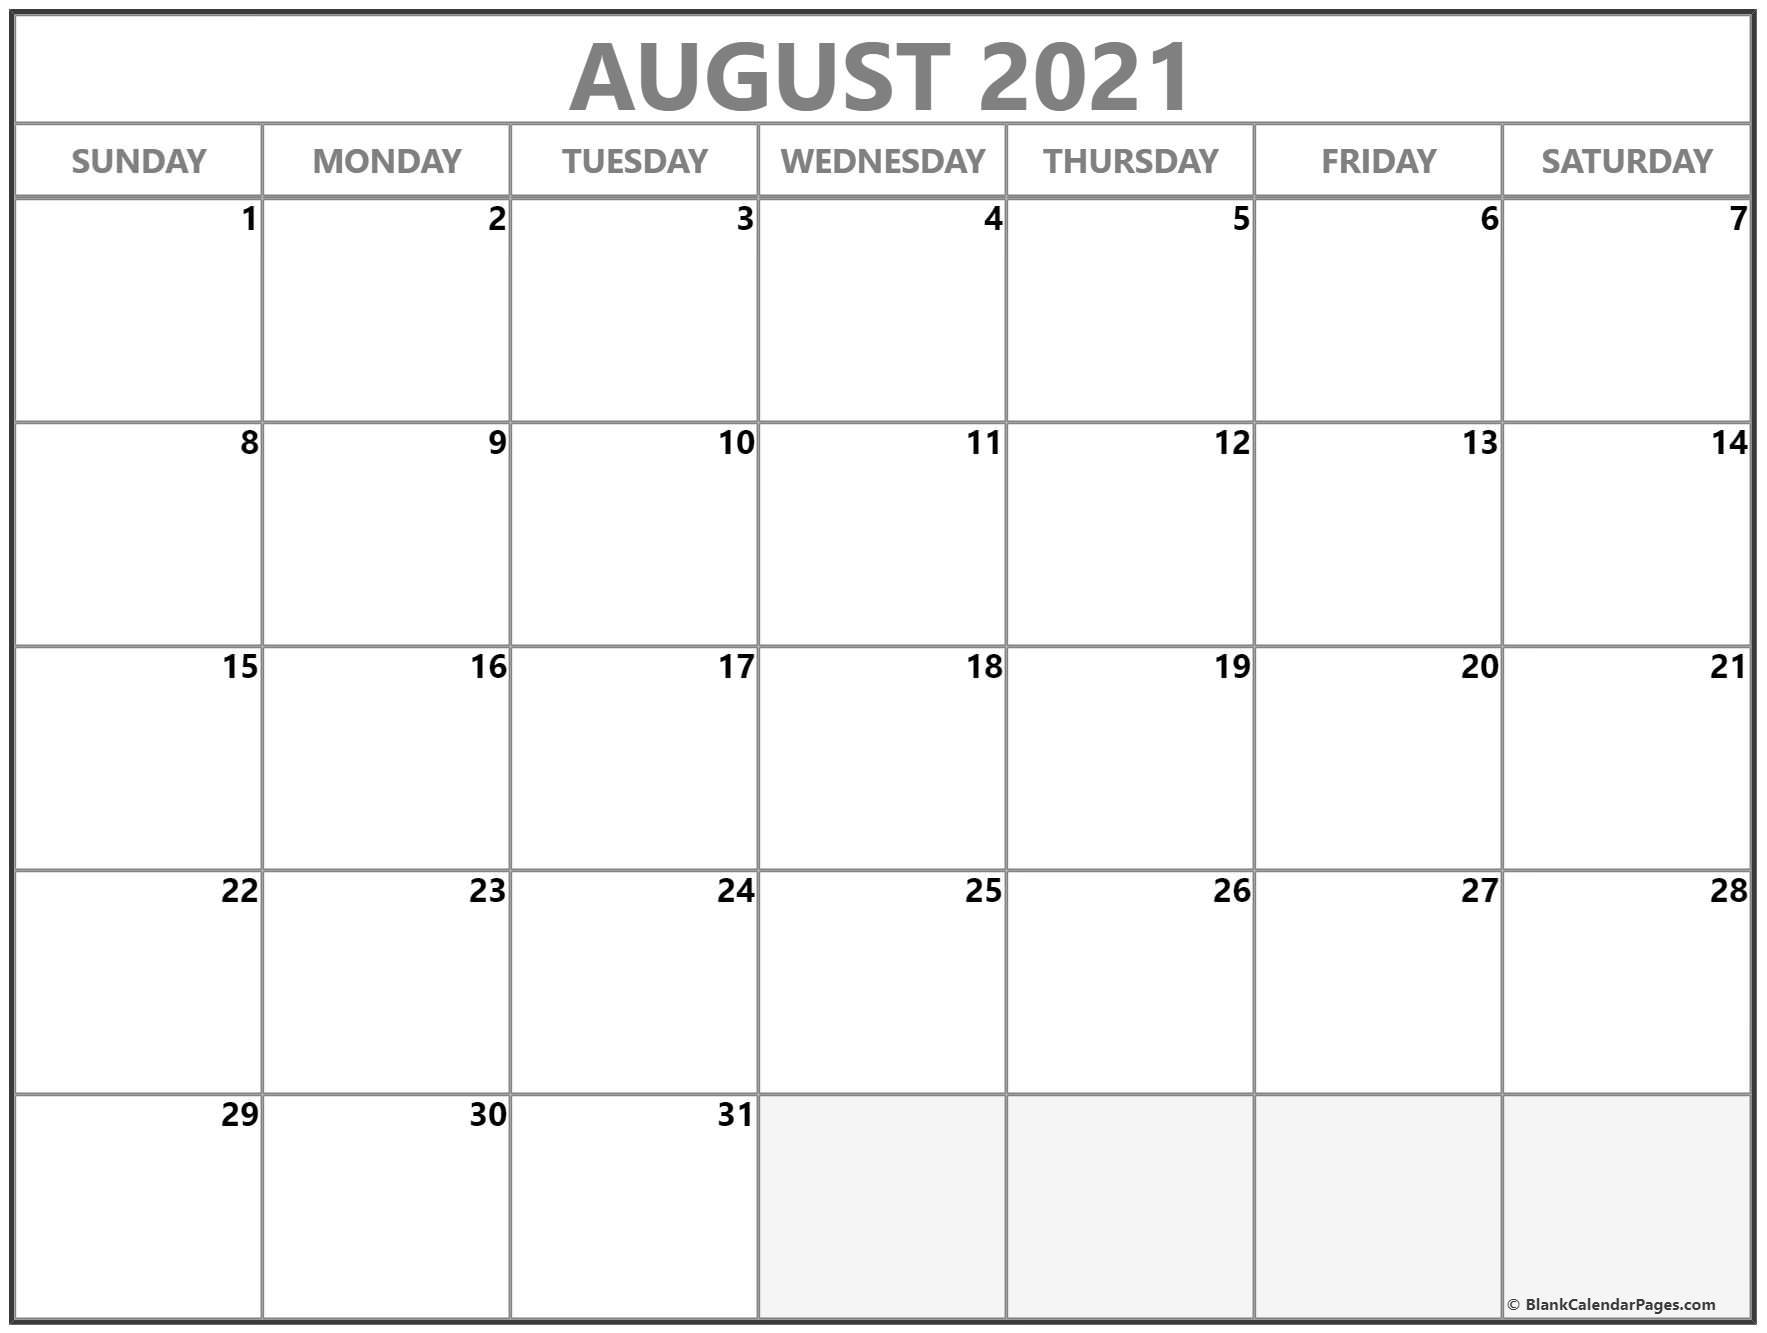 August 2021 Calendar   Free Printable Calendar Templates for August 2021 Calendar Print